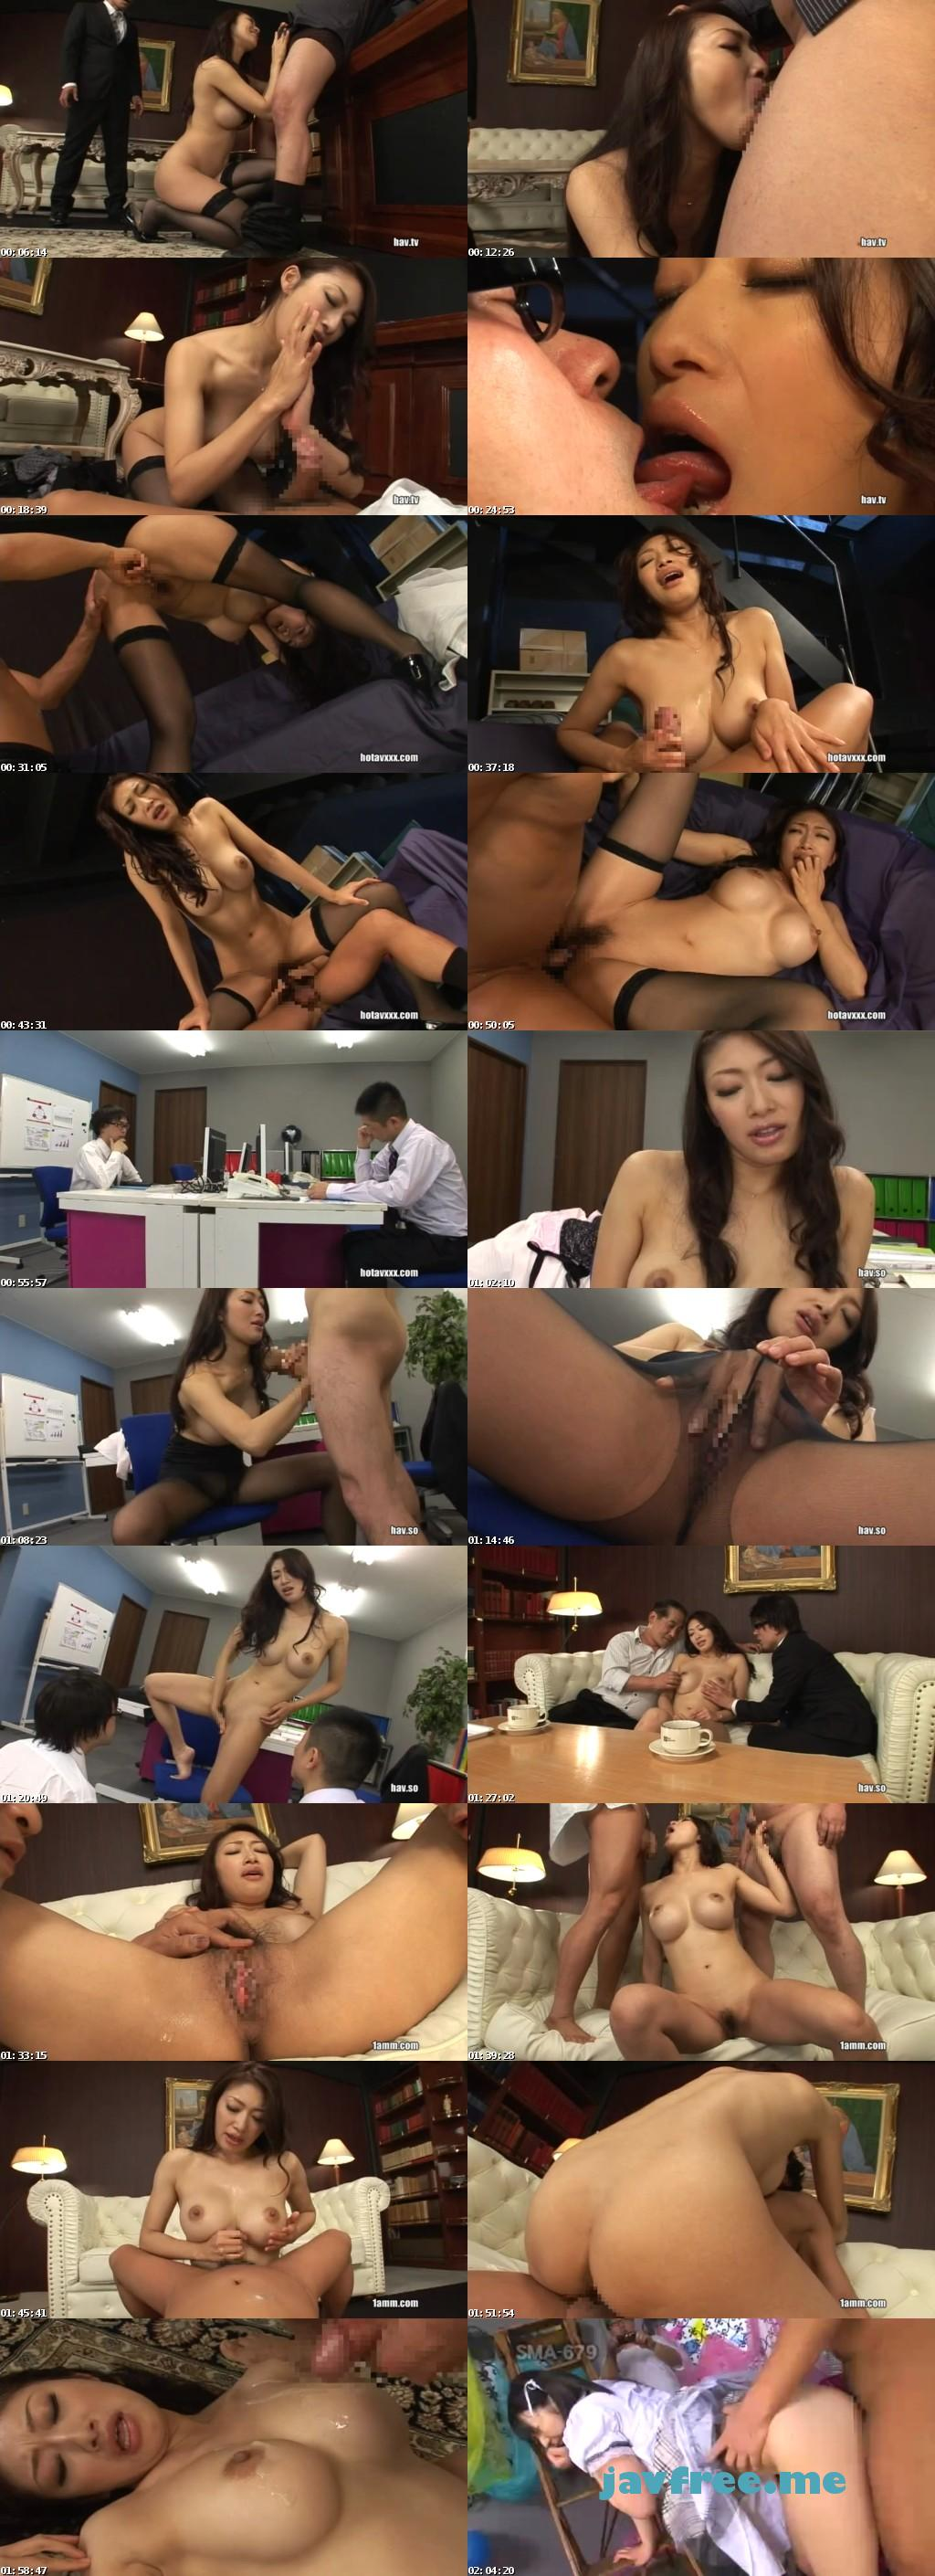 [SMA 688] ビジネス淫語とグラマラス秘書 小早川怜子 小早川怜子 SMA